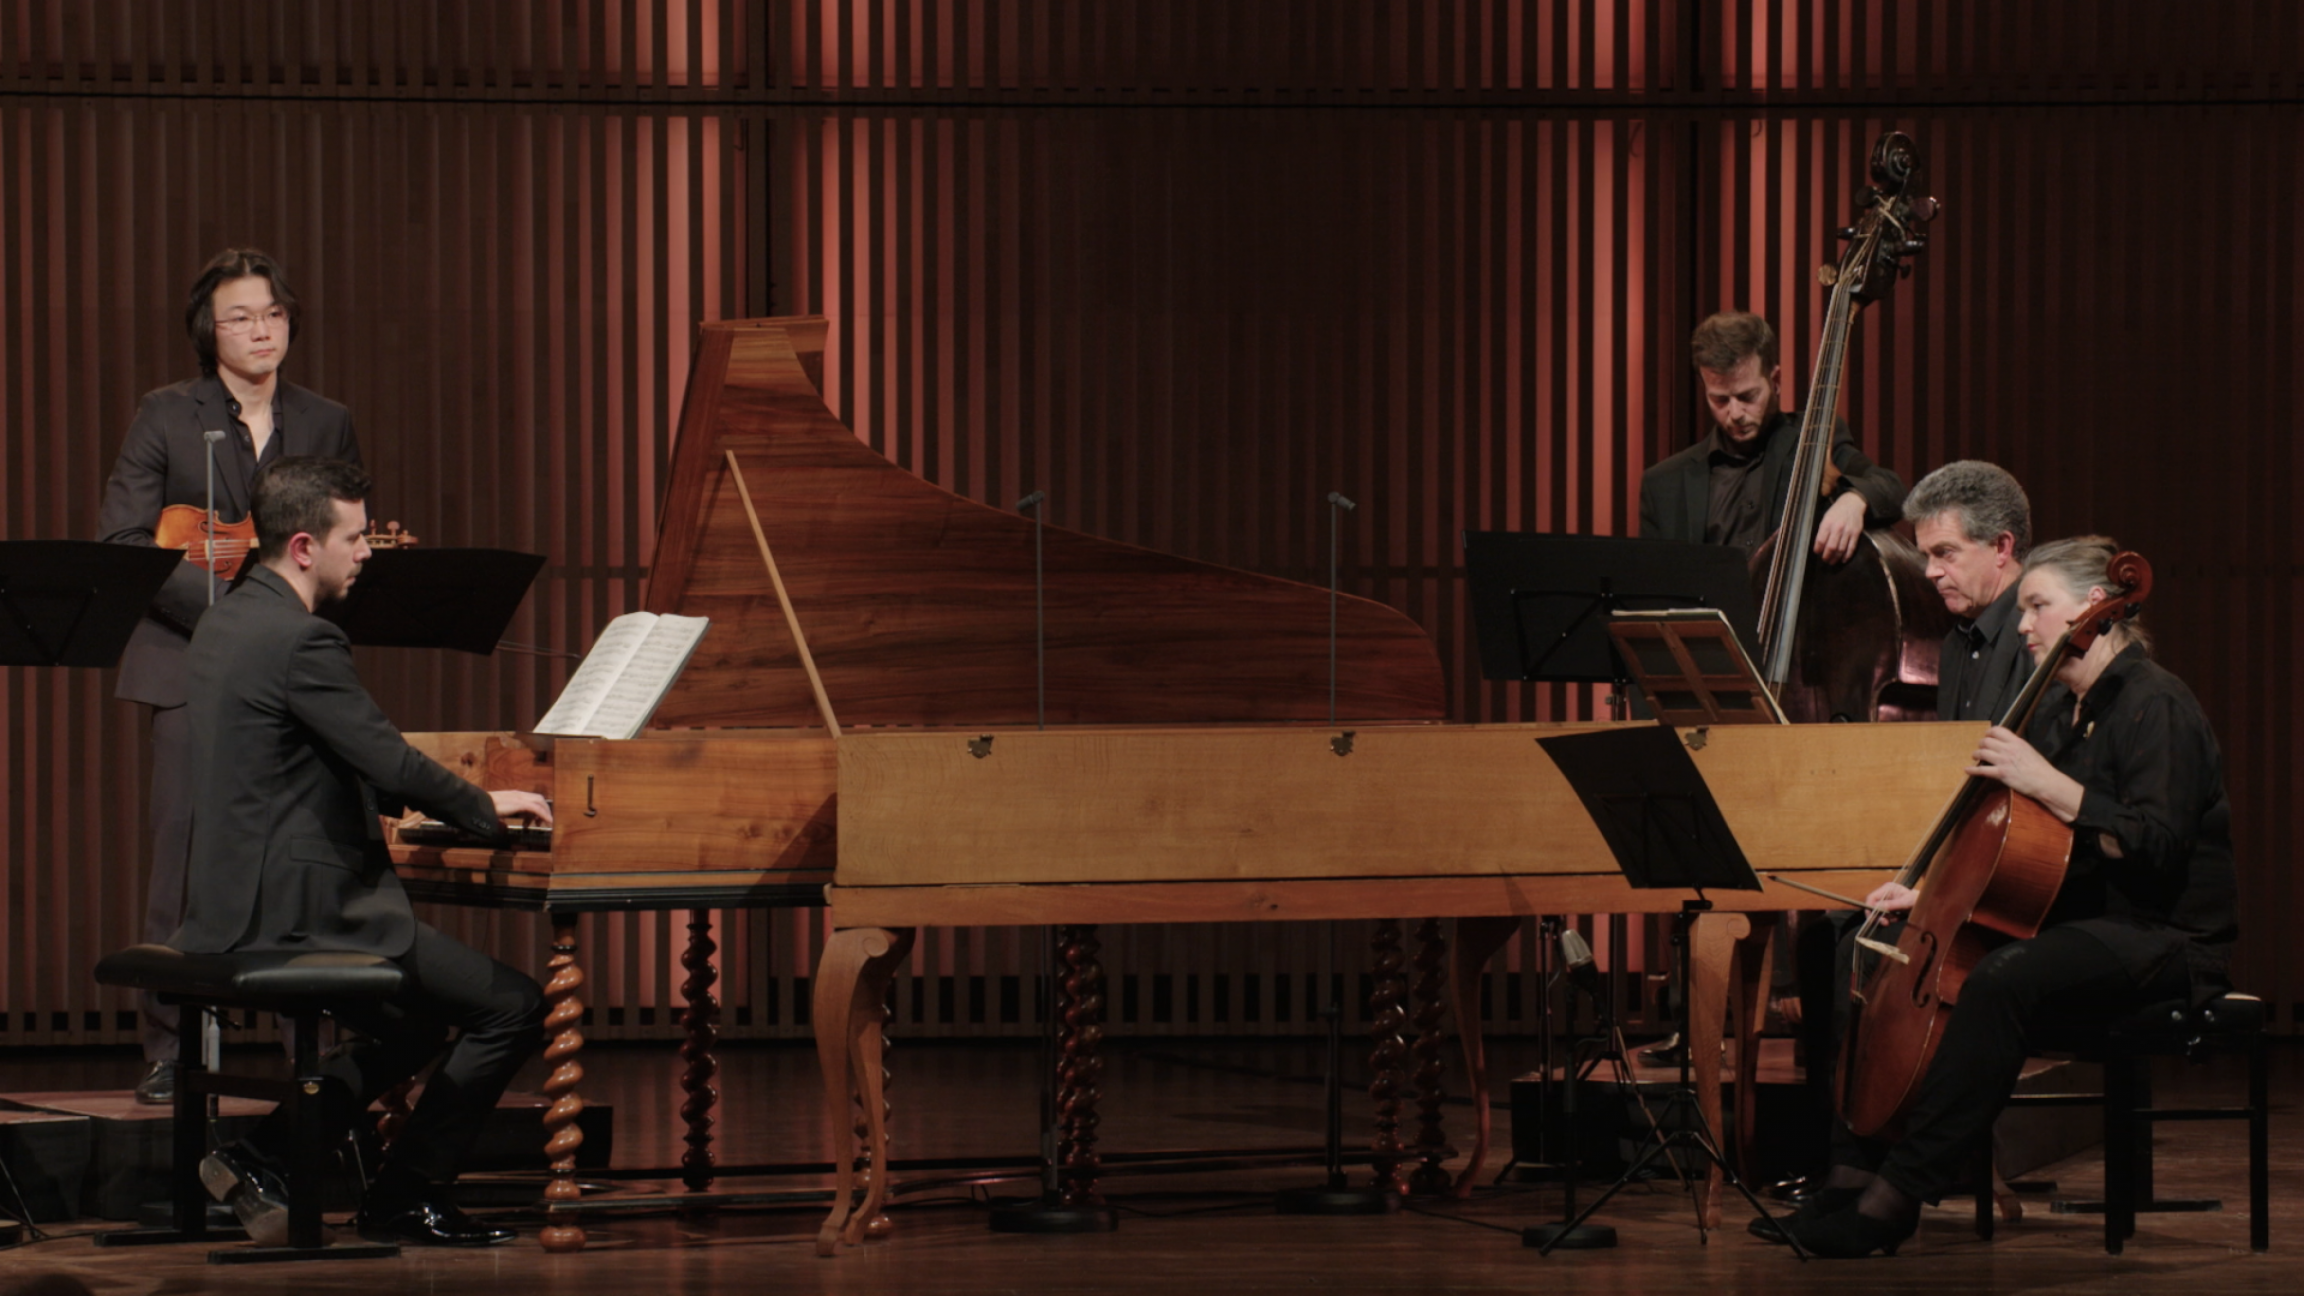 Concerto for two harpsichords in C major